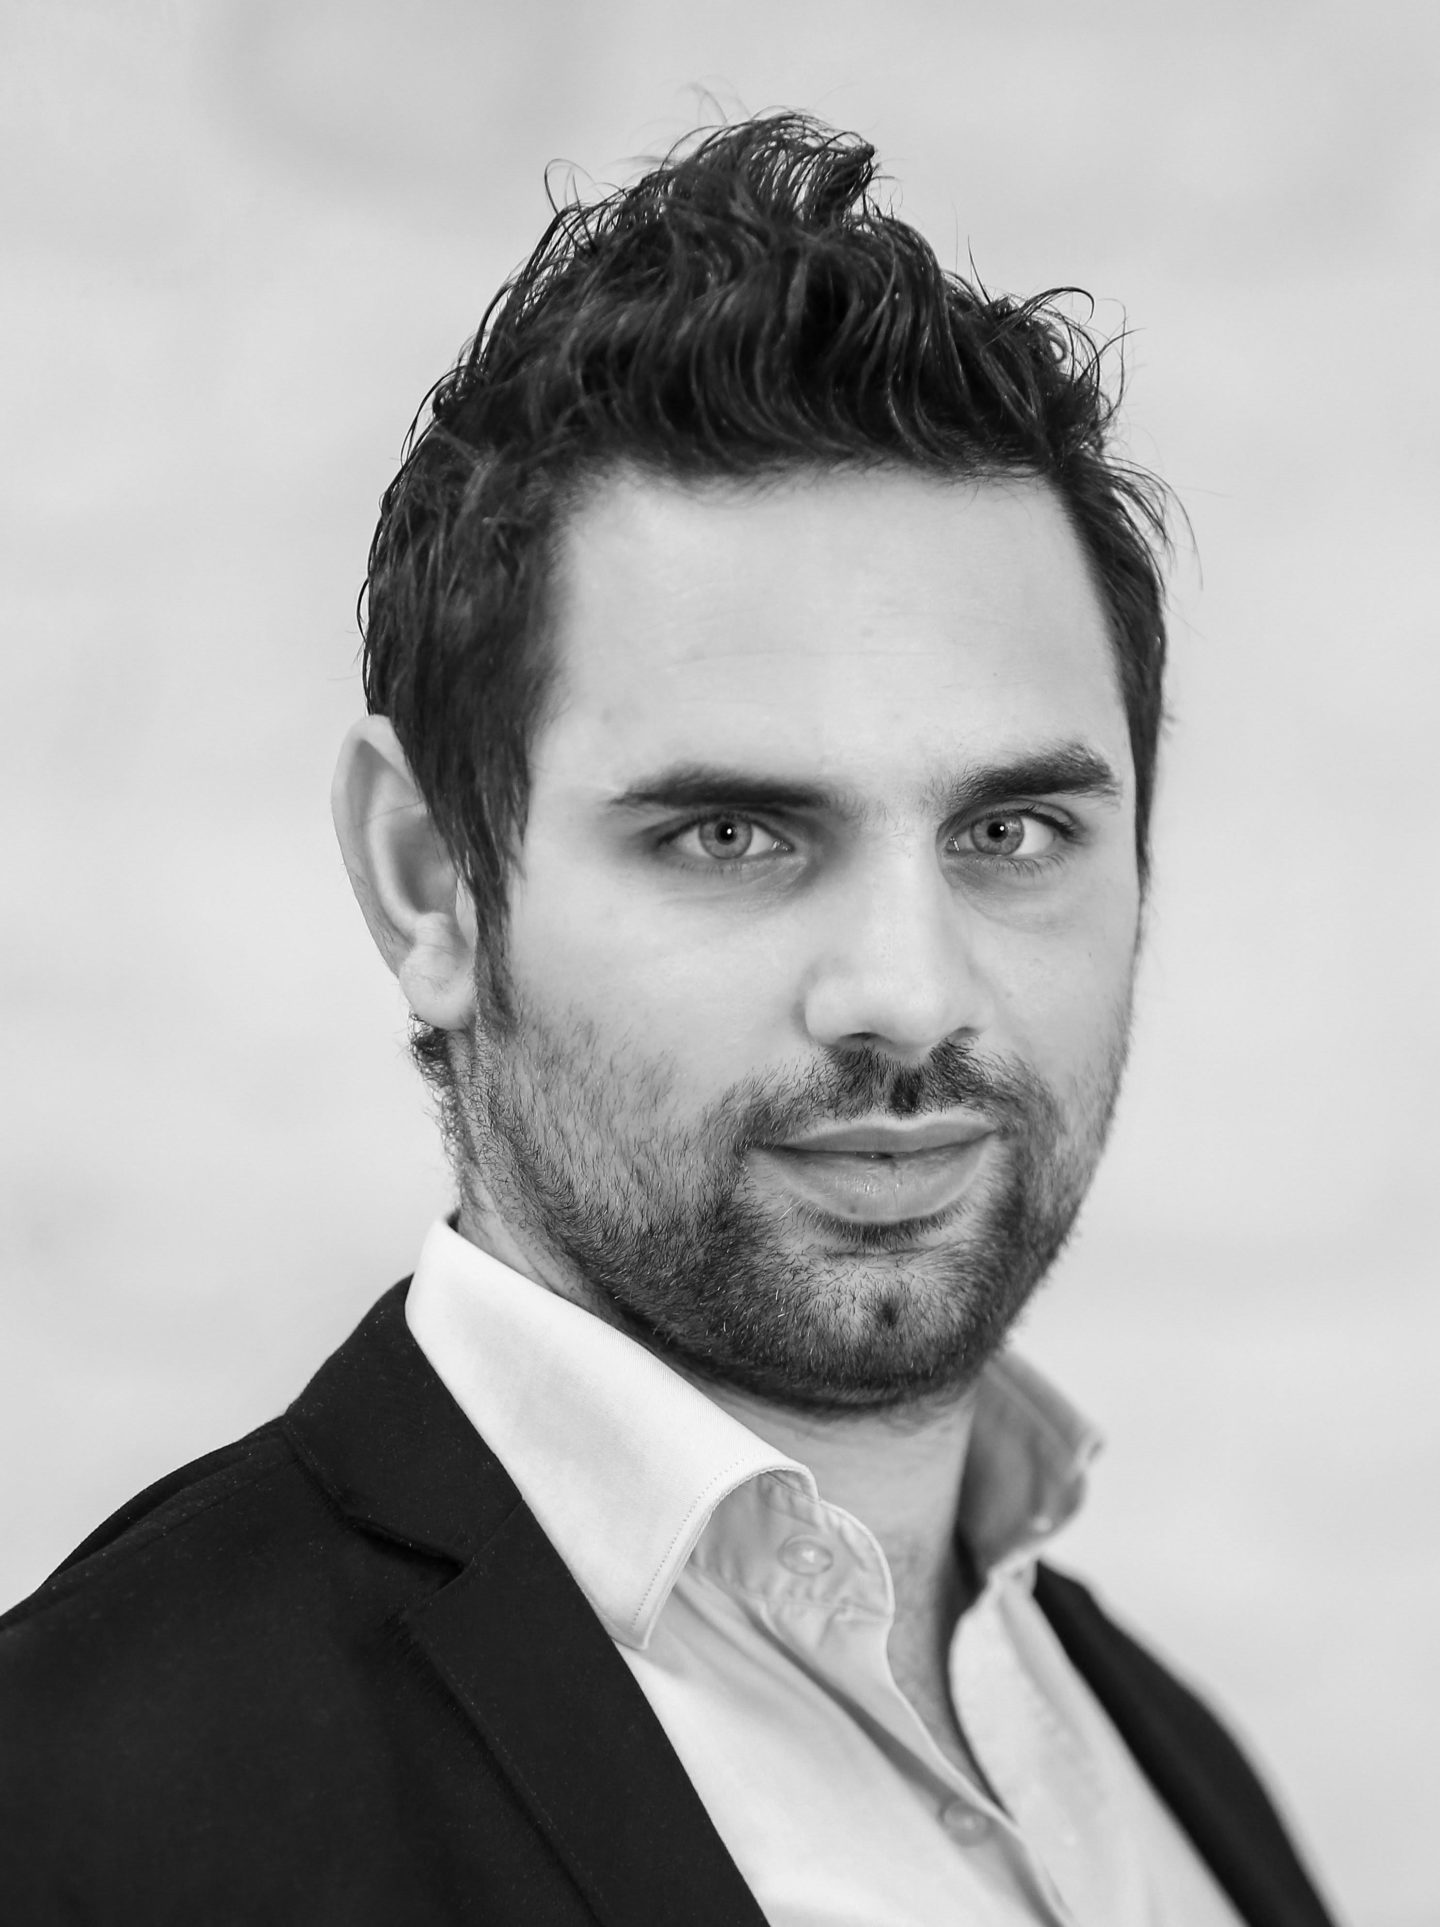 Julien Badr